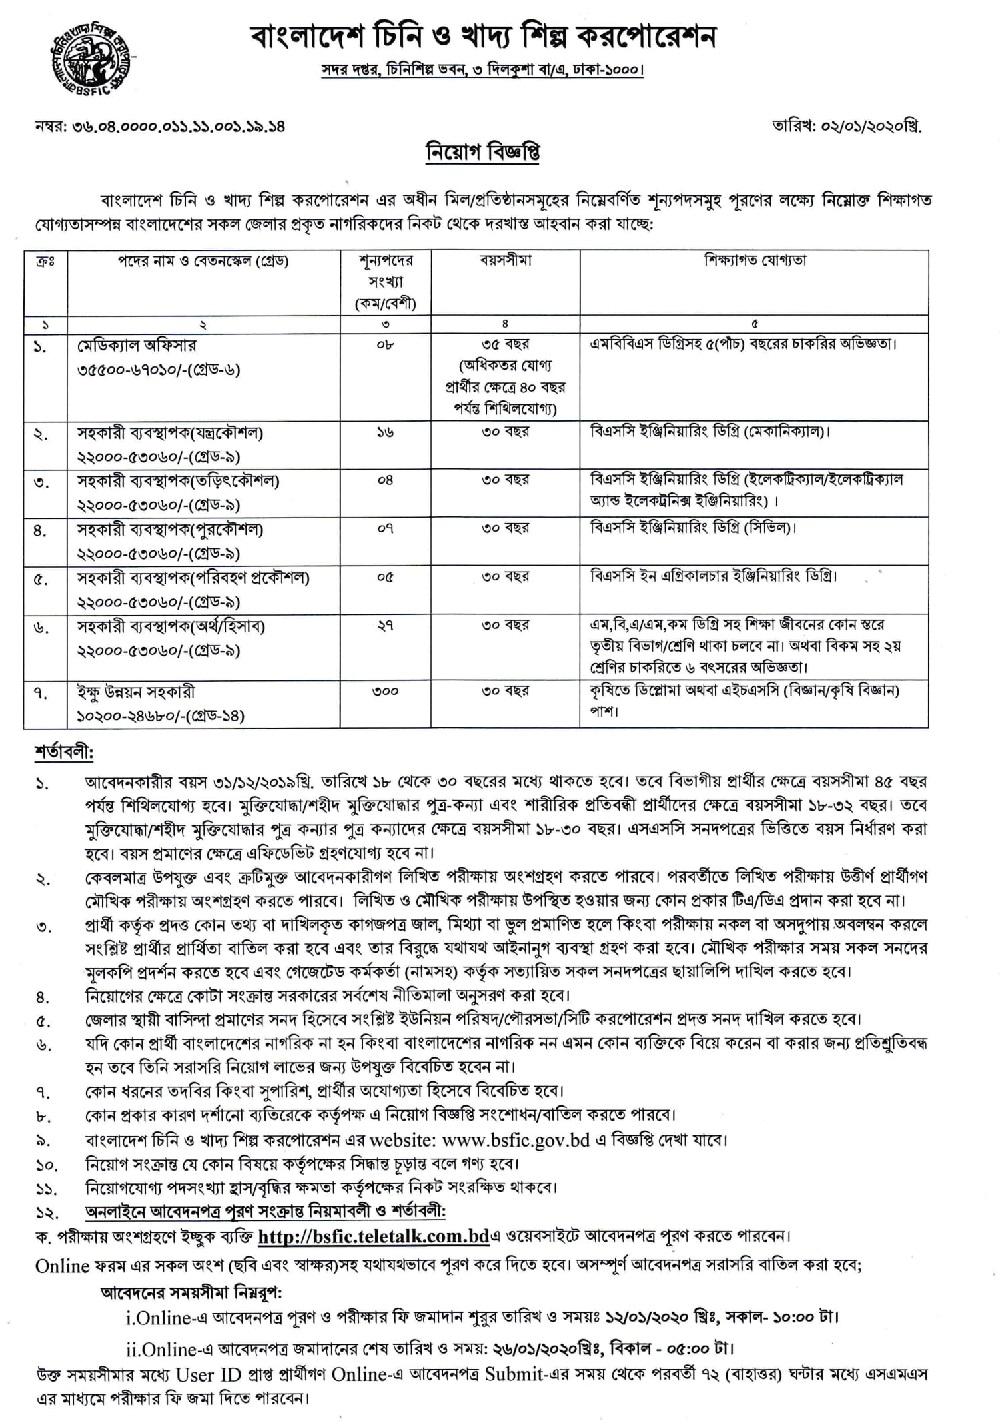 BSFIC Job Circular 2020